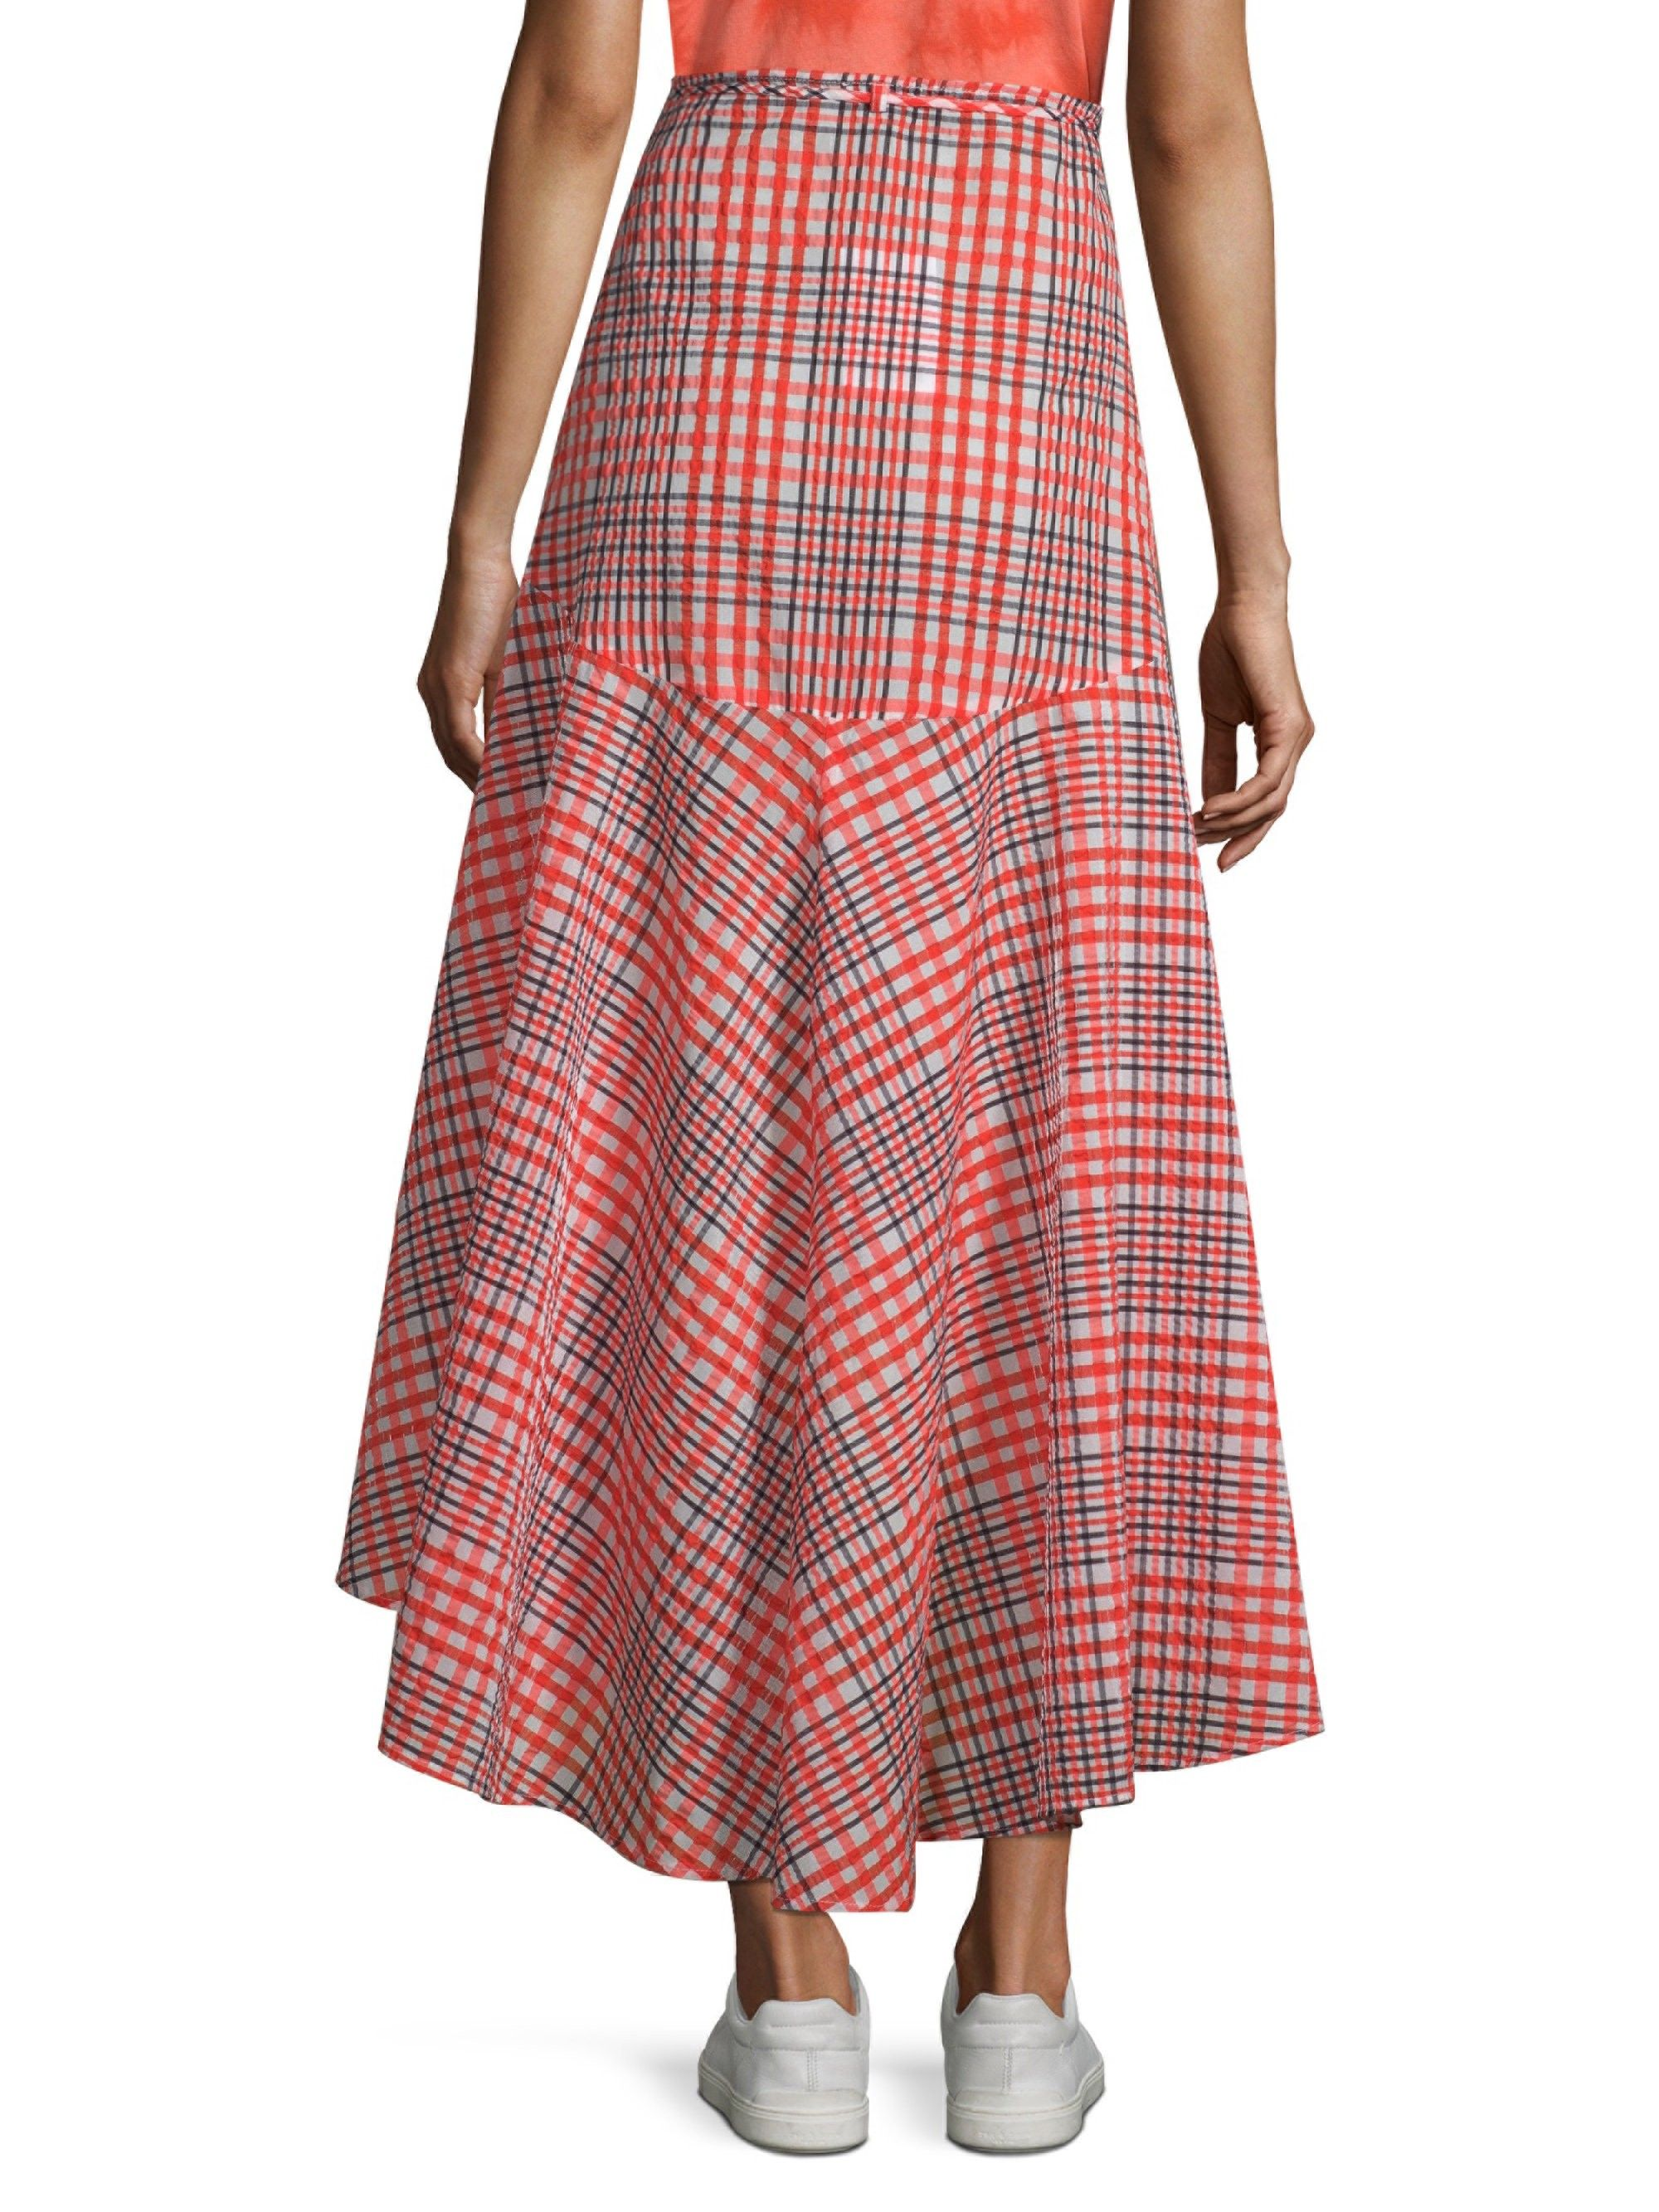 4521633fb1 Ganni Charron Plaid Wrap Skirt - Big Apple 40 (8) | Products ...